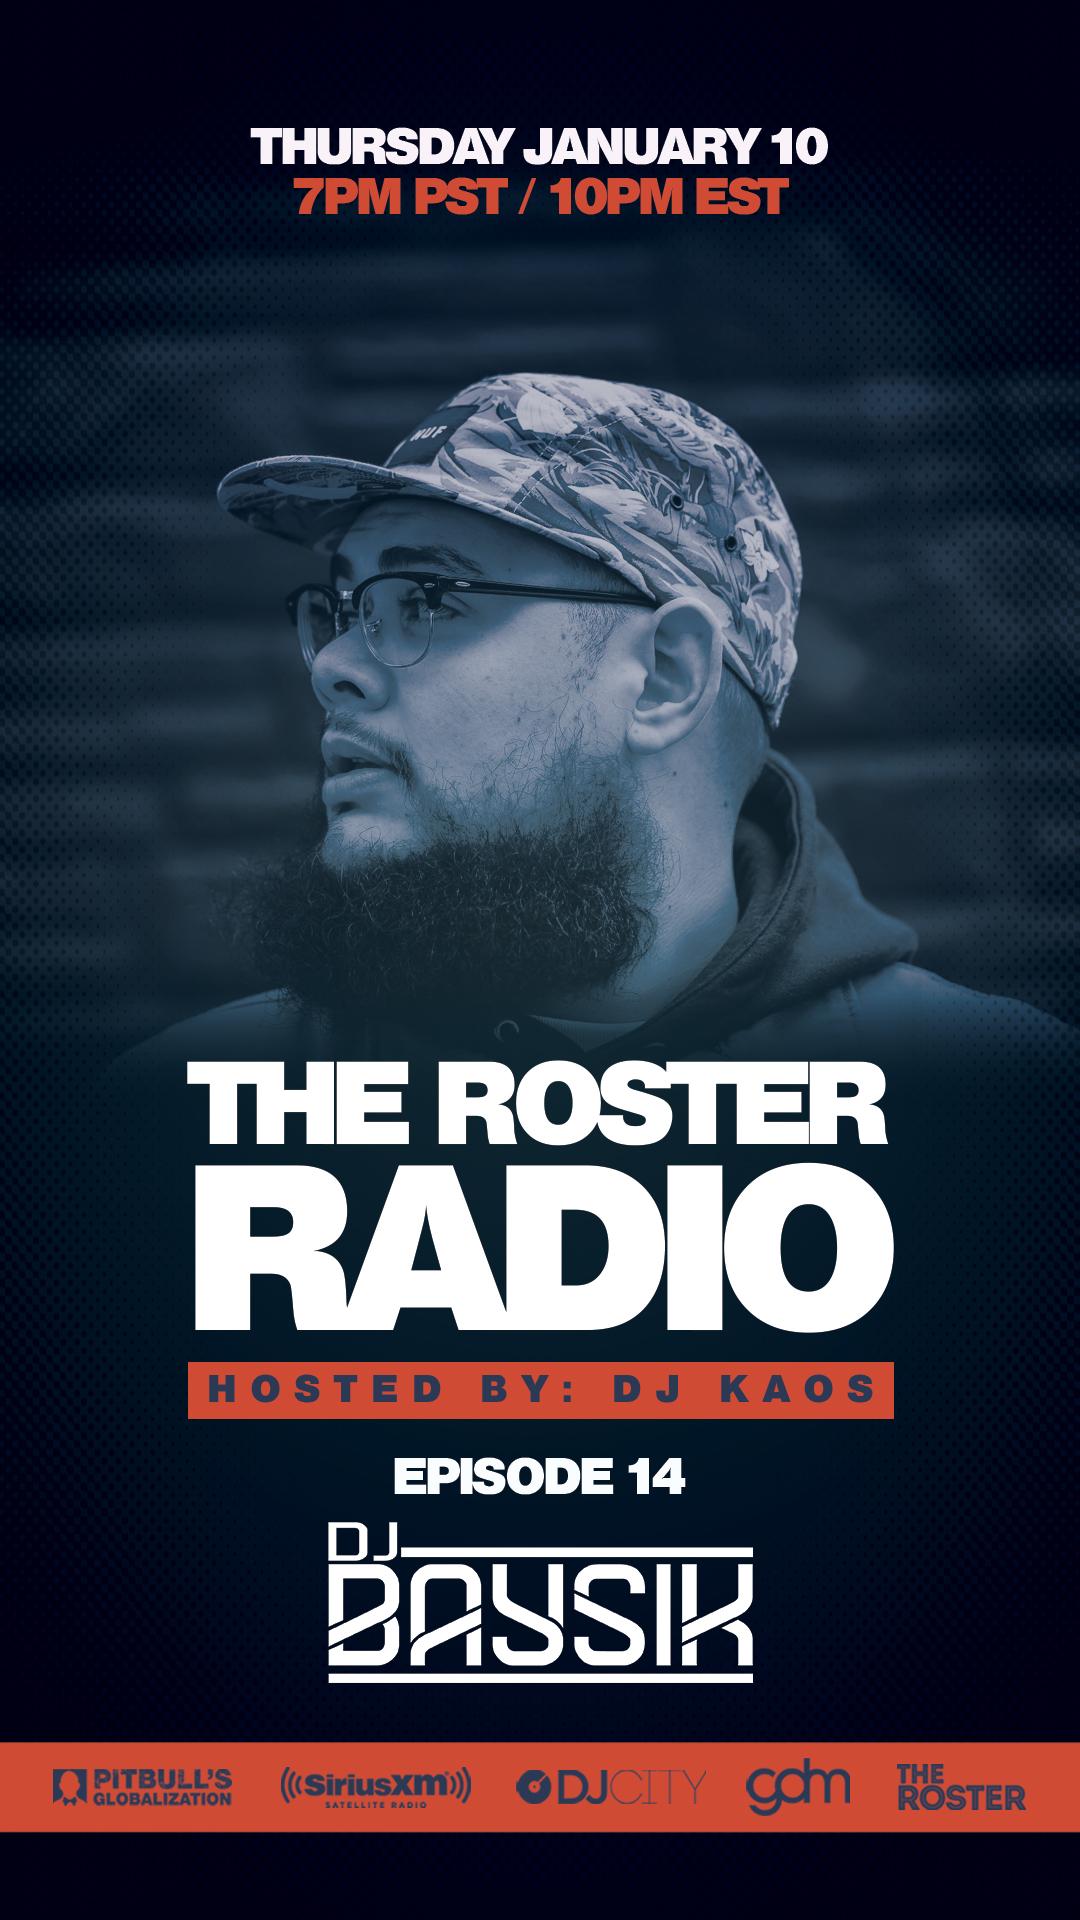 TheRosterRadio-Episode14-Baysik-Art.jpg